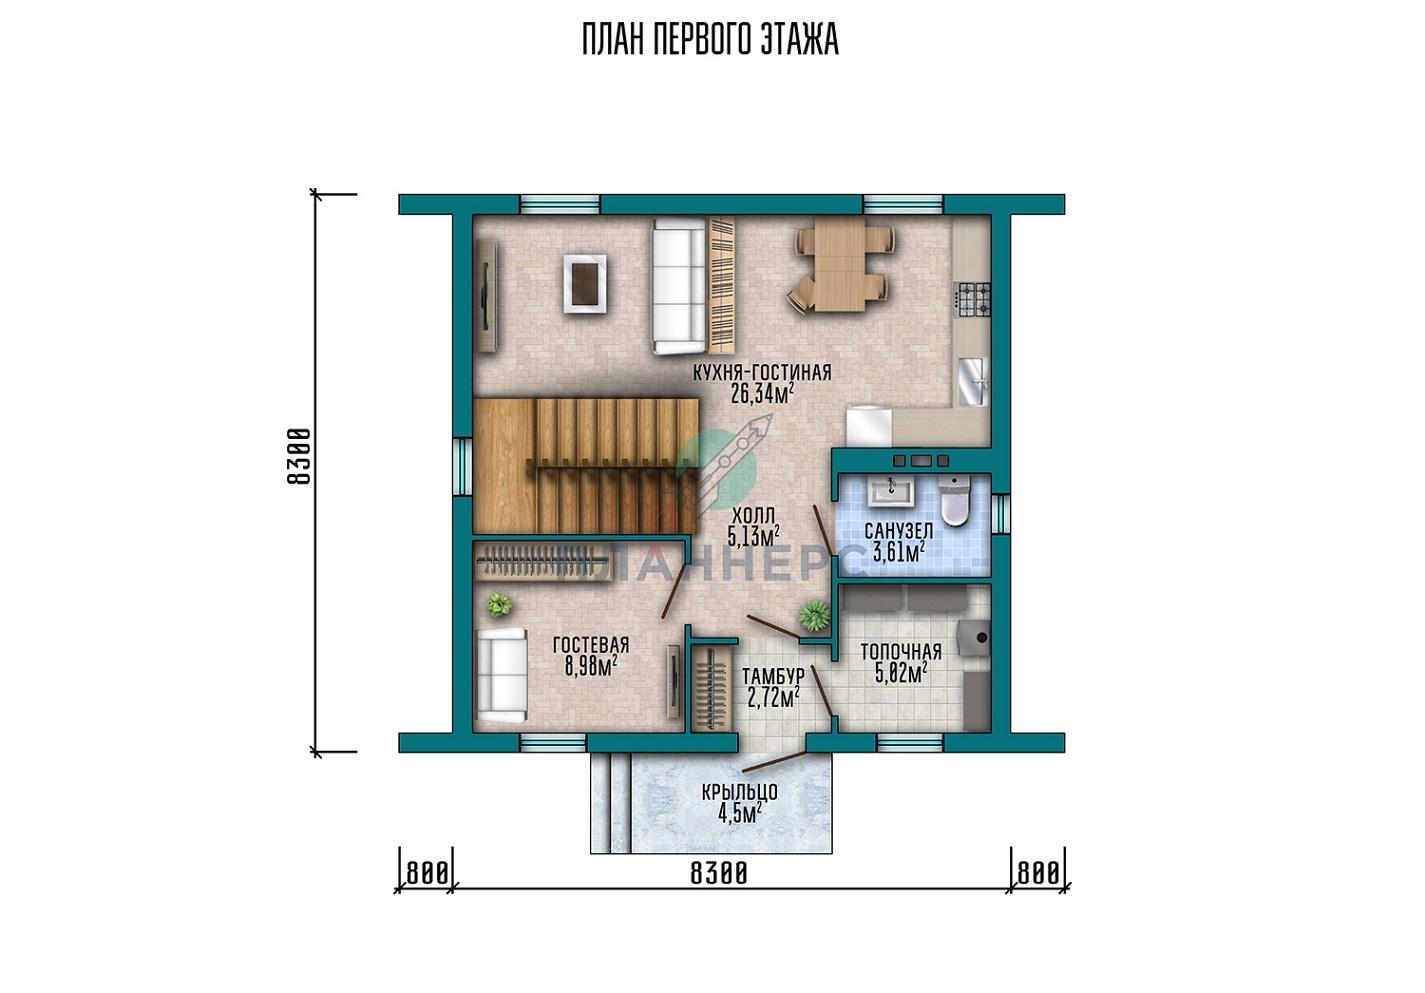 Проект дома Планнерс 025-105-1М план